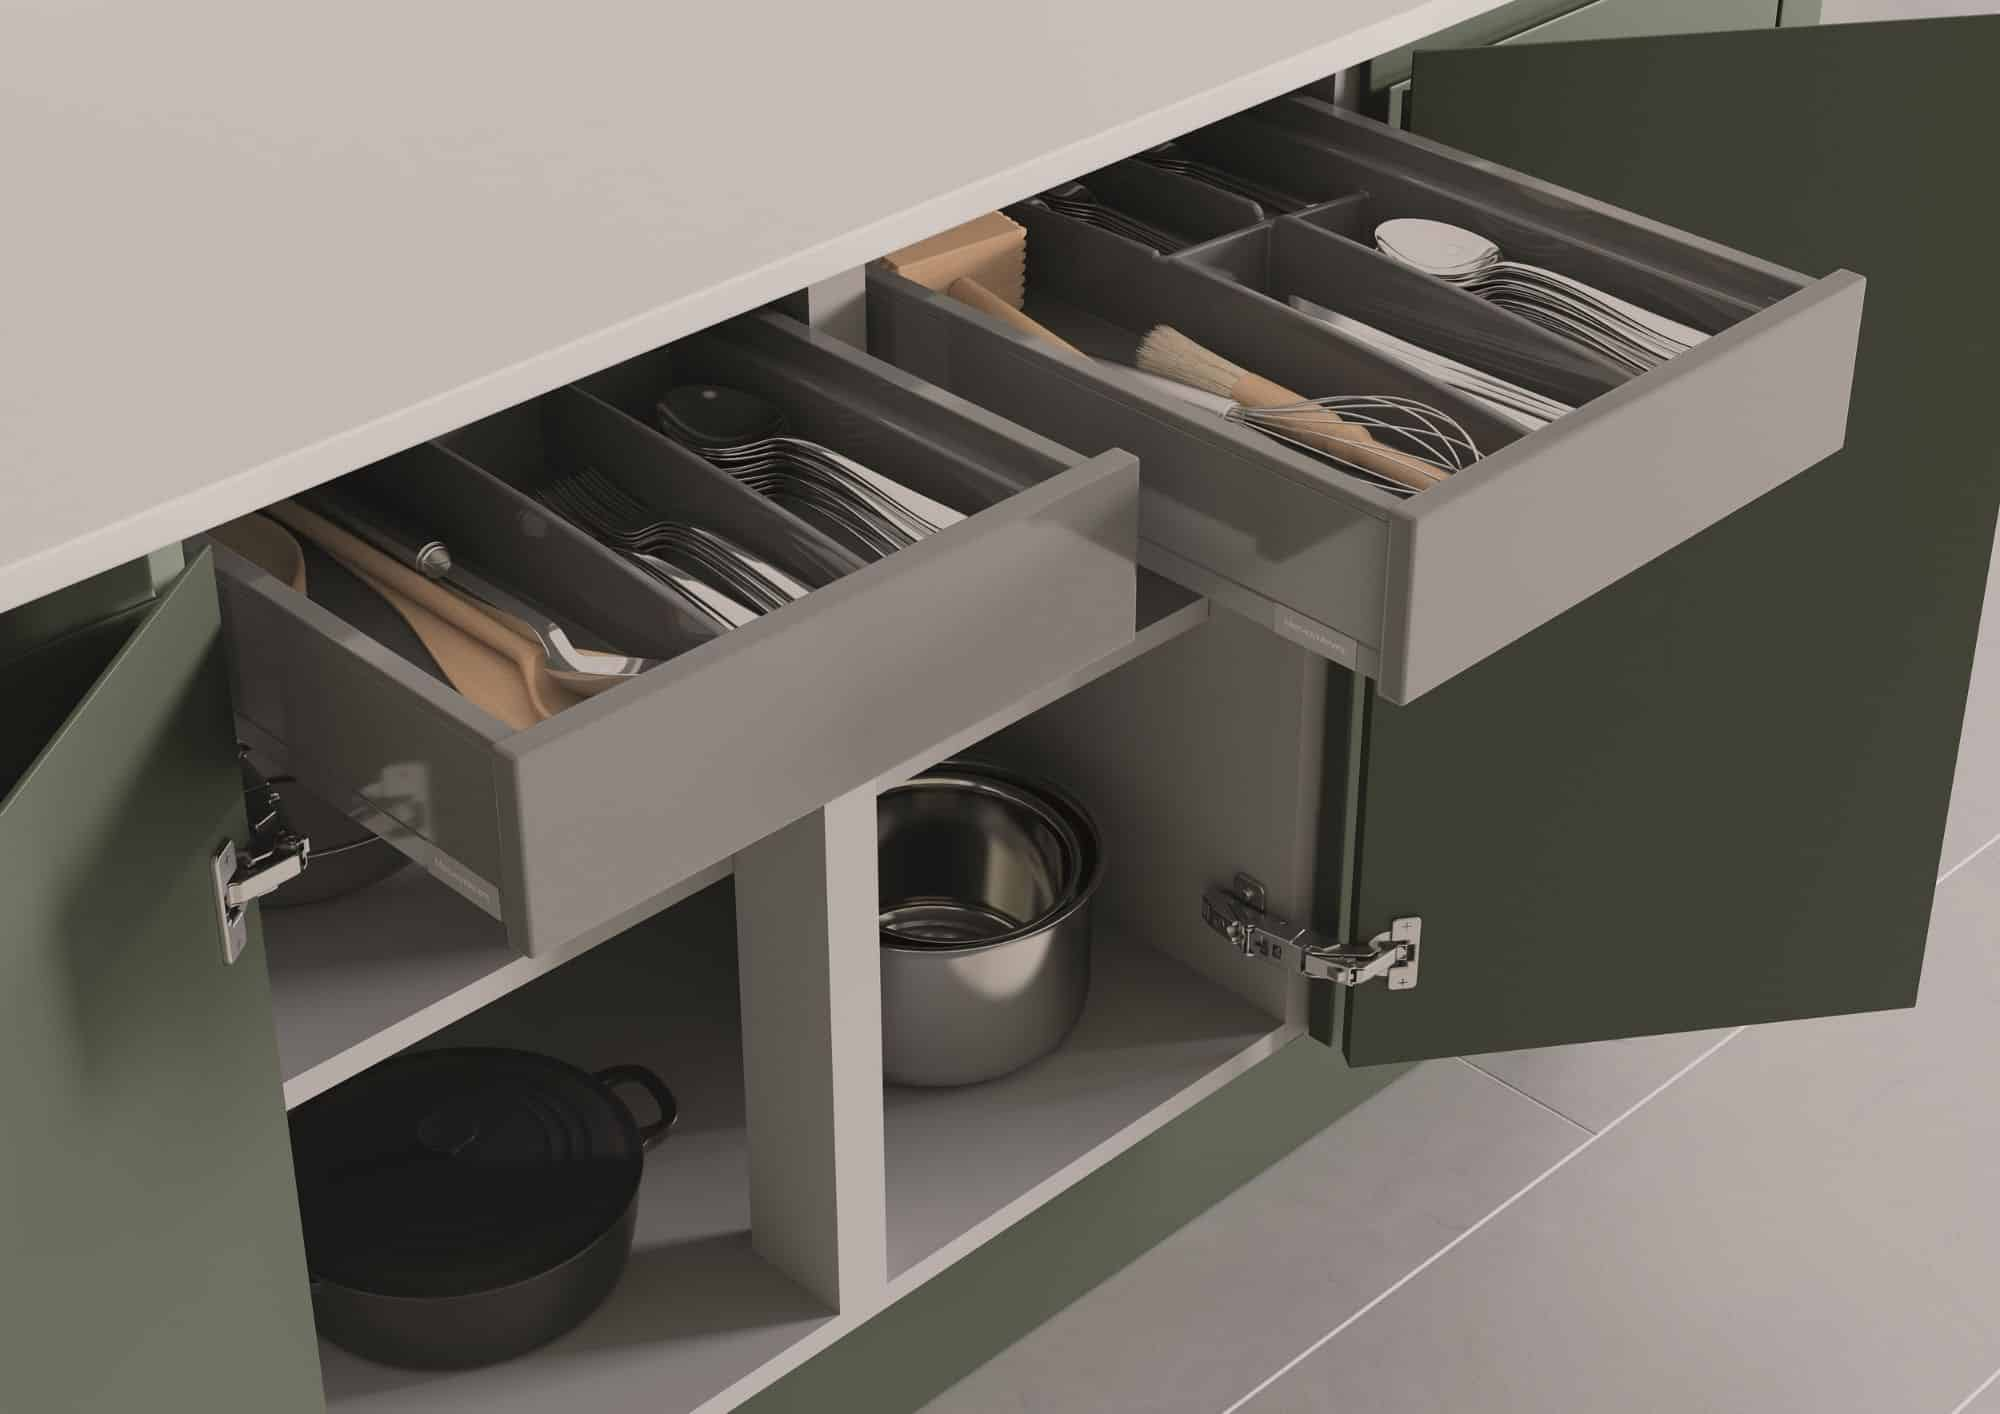 Kitchen Cupboard Open